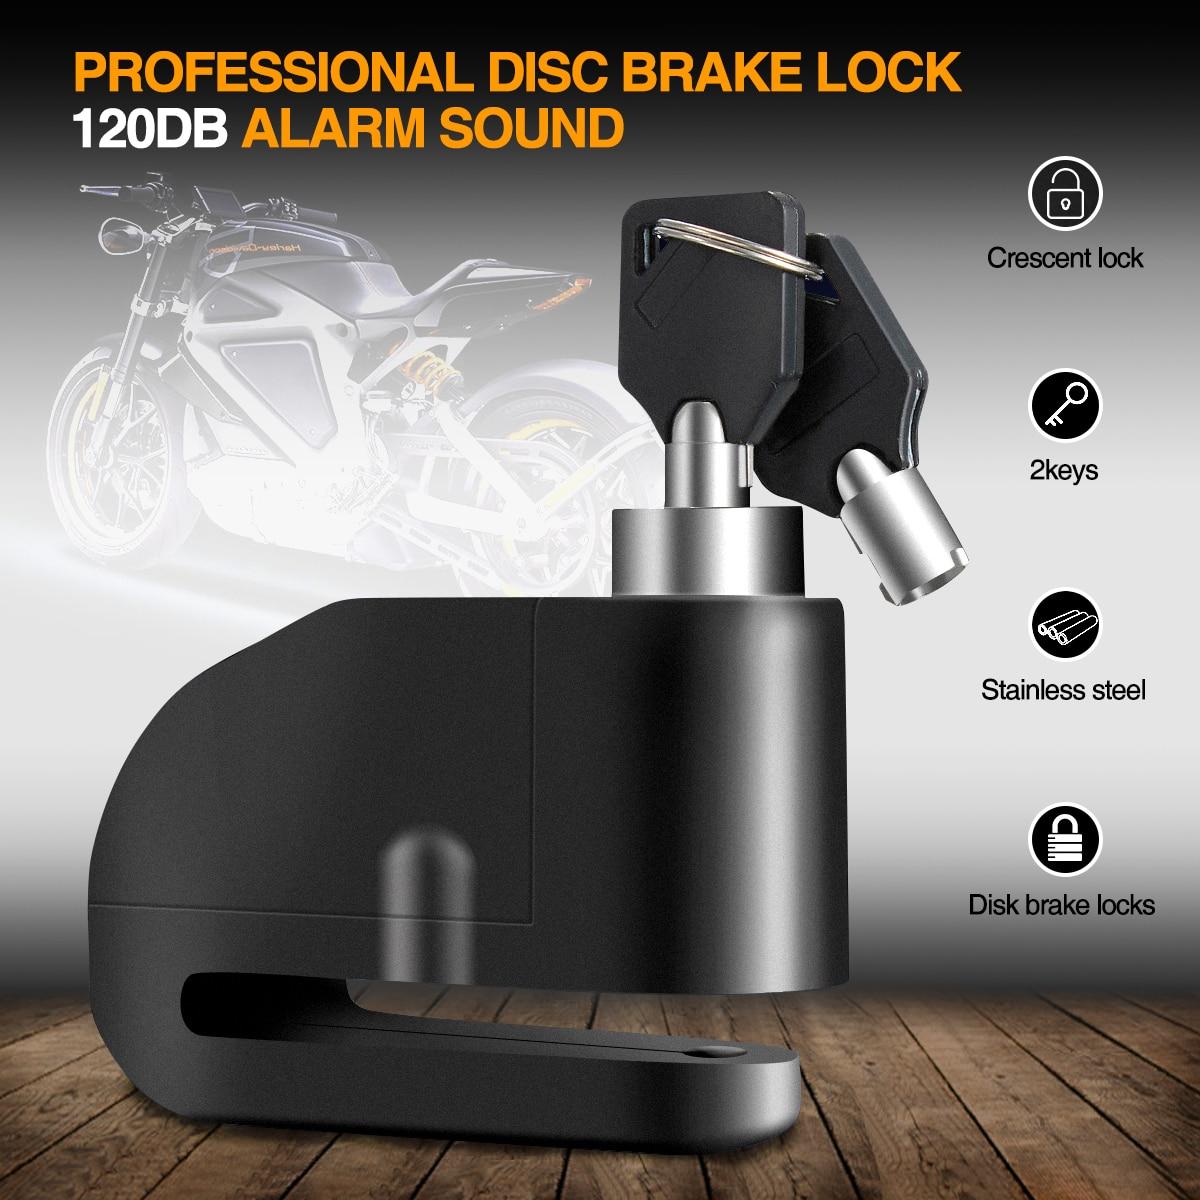 New 7mm Motorbike Motorcycle Sturdy Wheel Disc Brake Lock Security Anti Thief Alarm